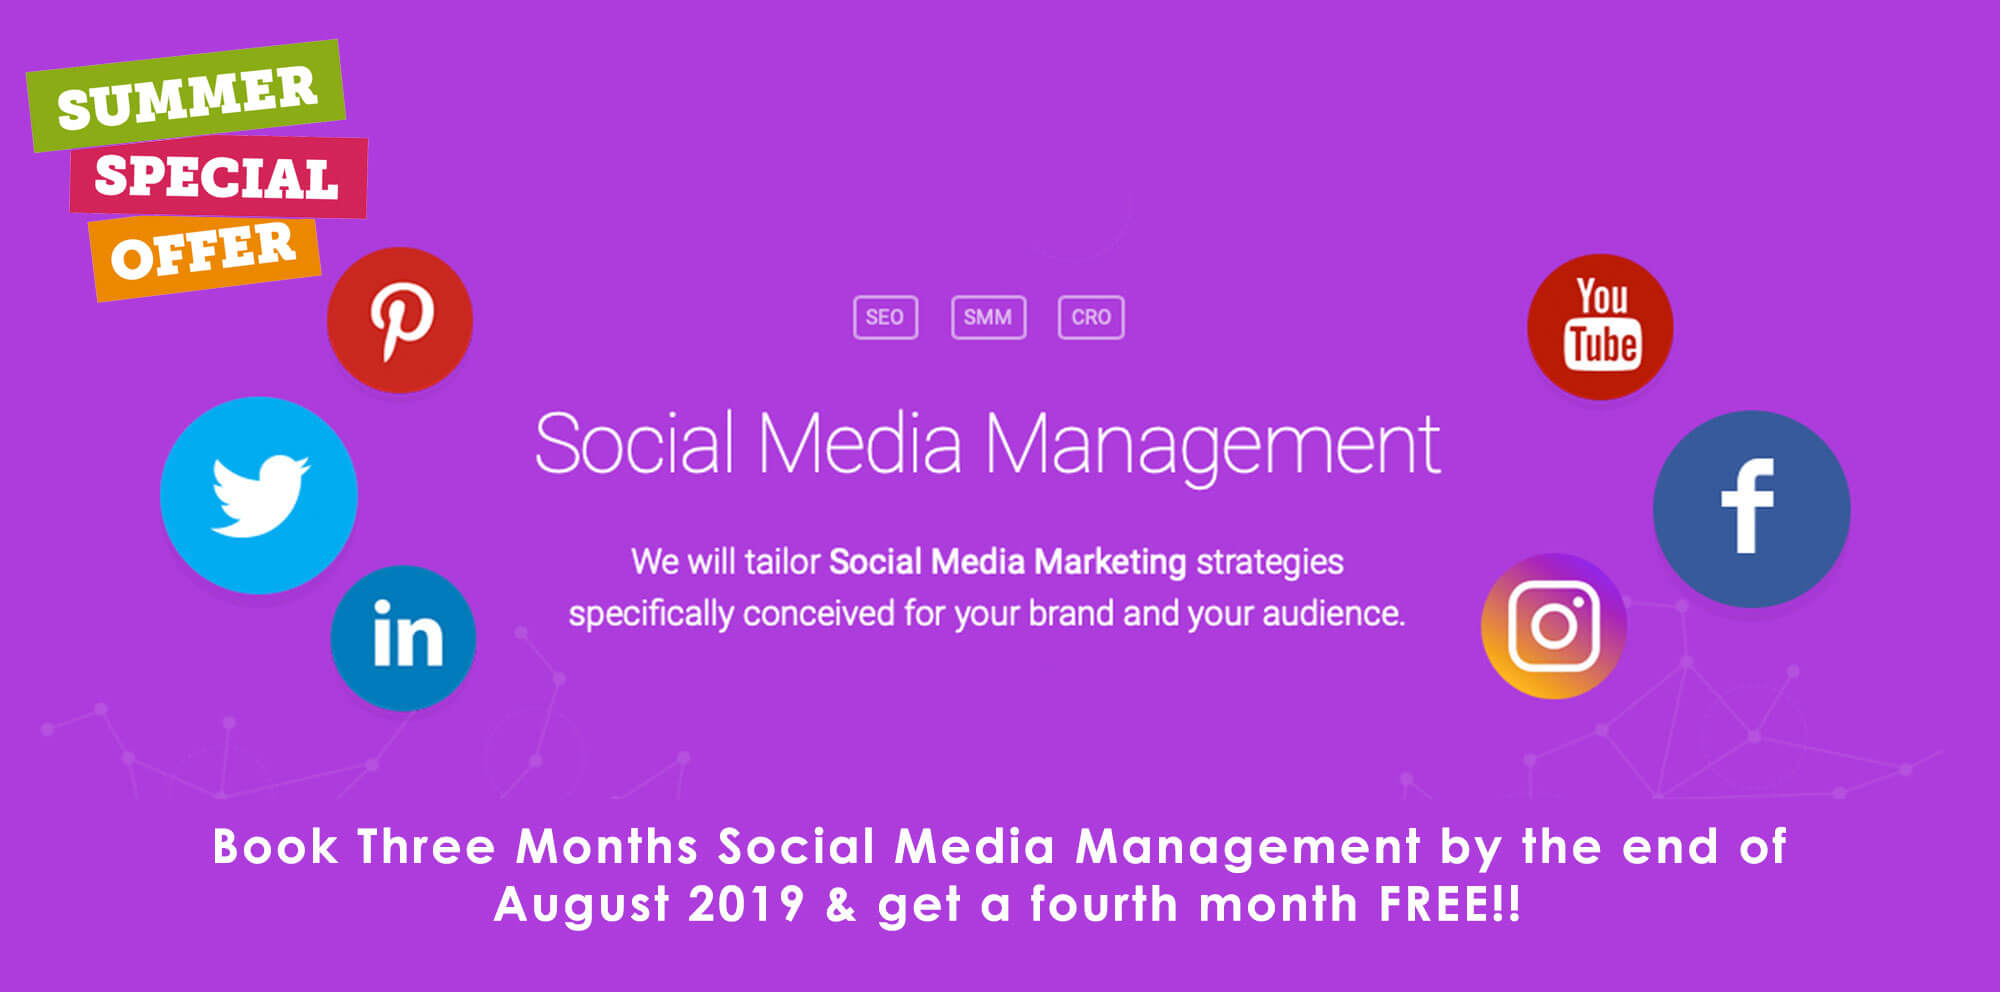 Social Media Management Offer